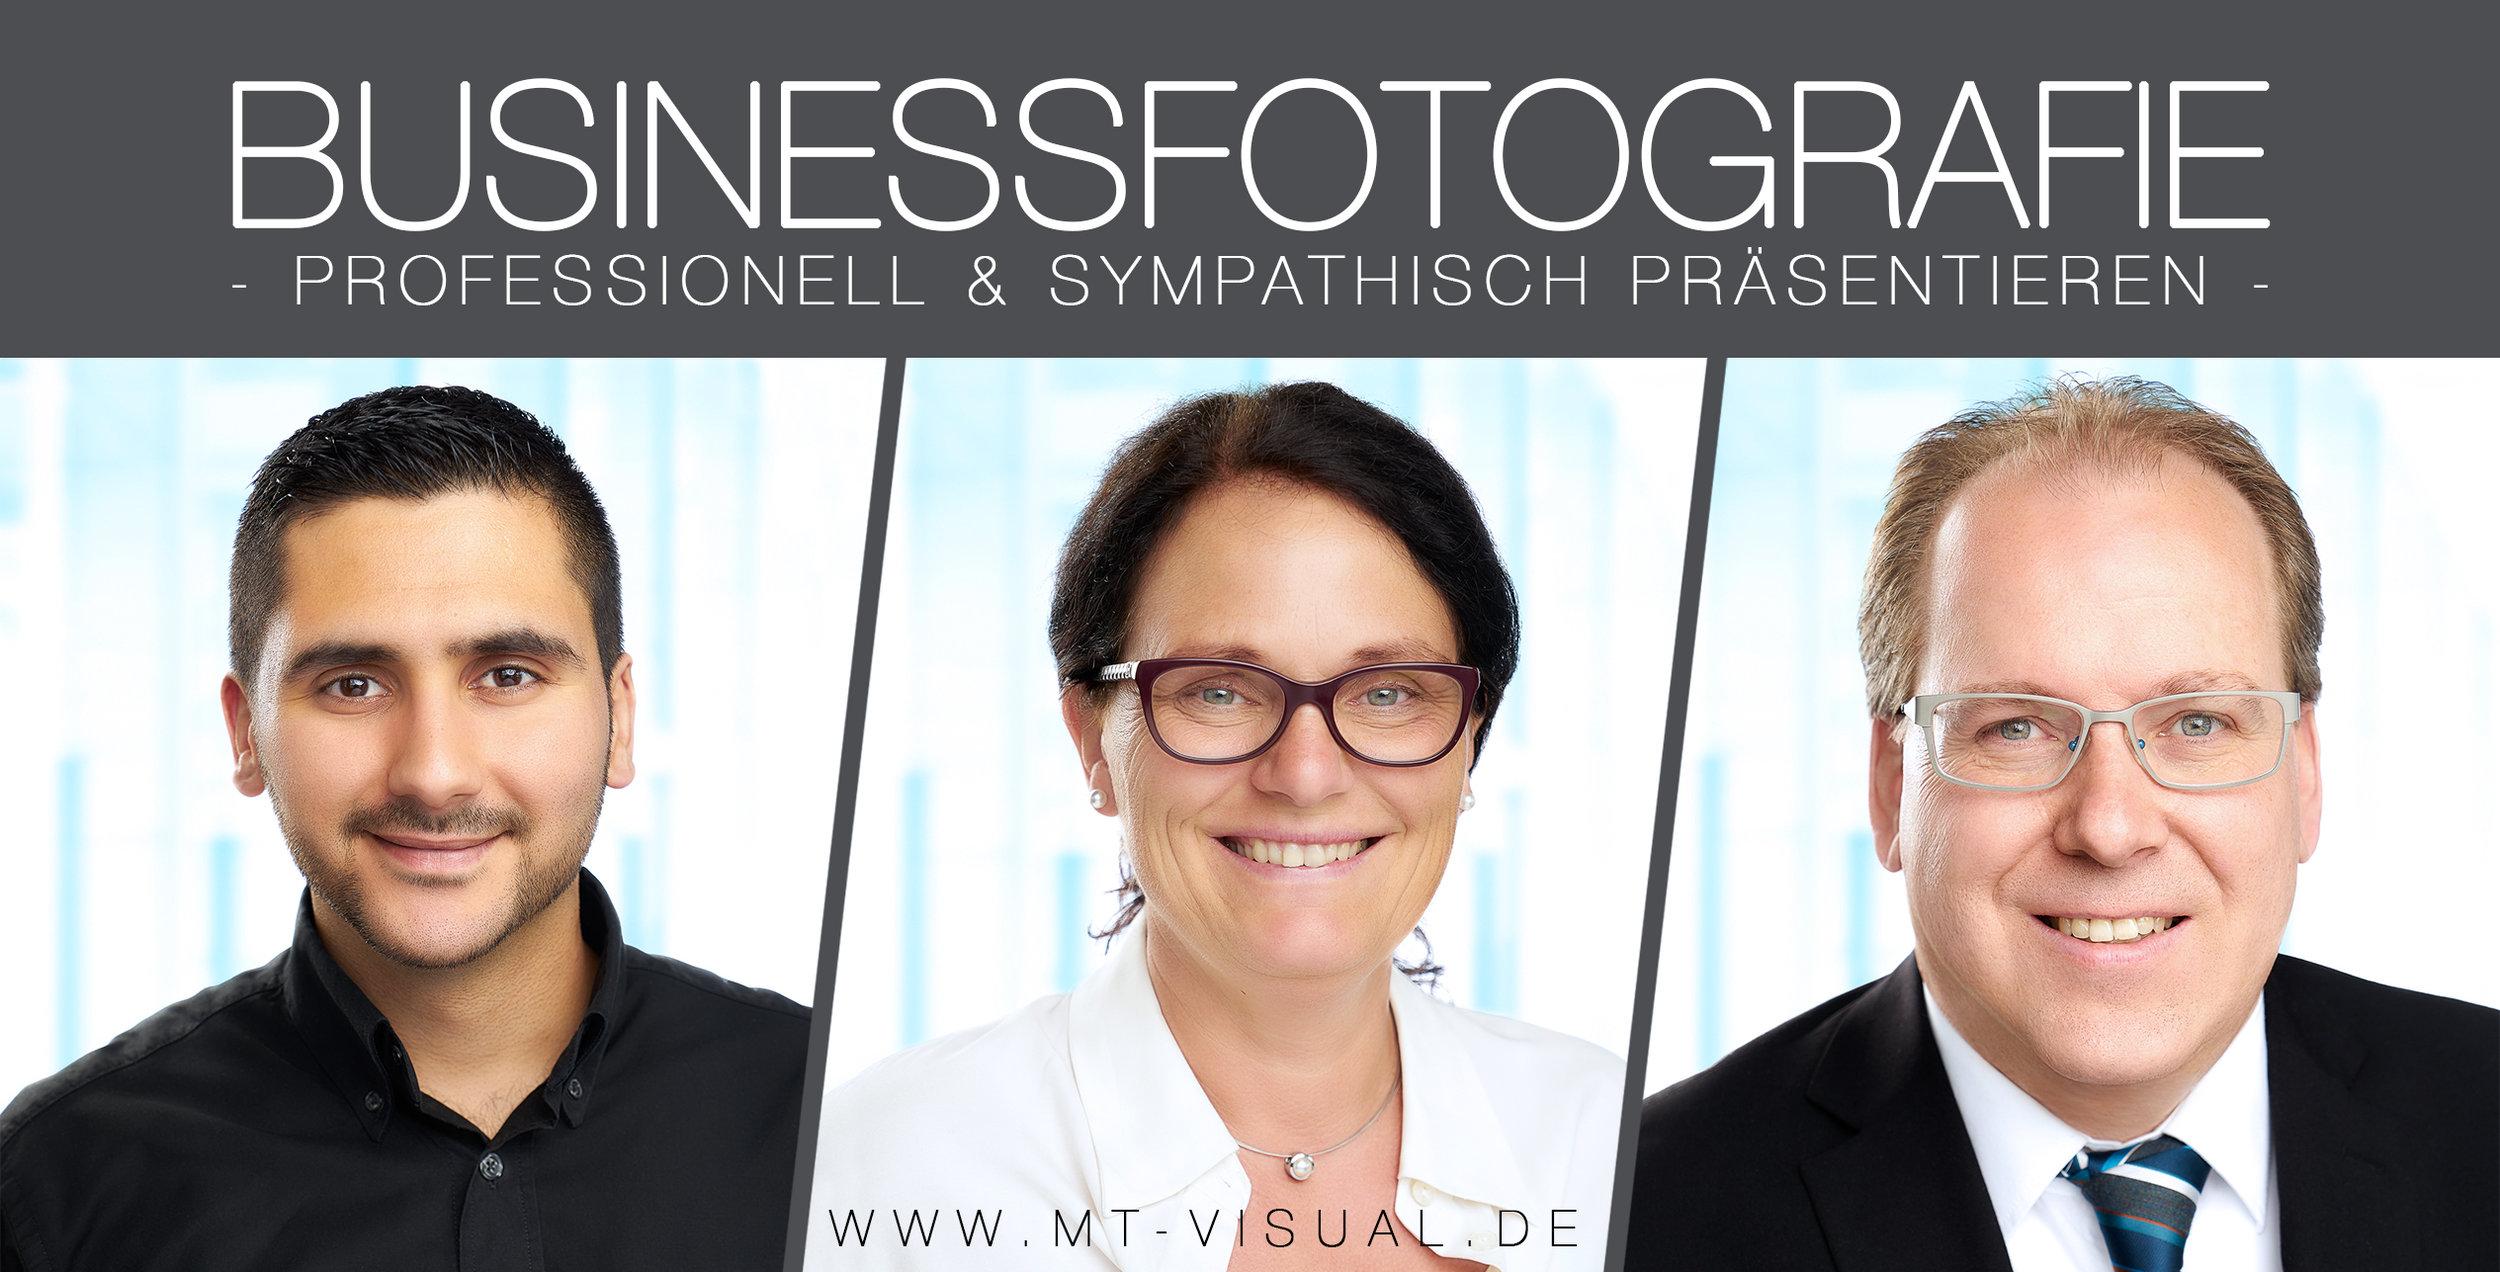 Businessfotografie - MT-Visual